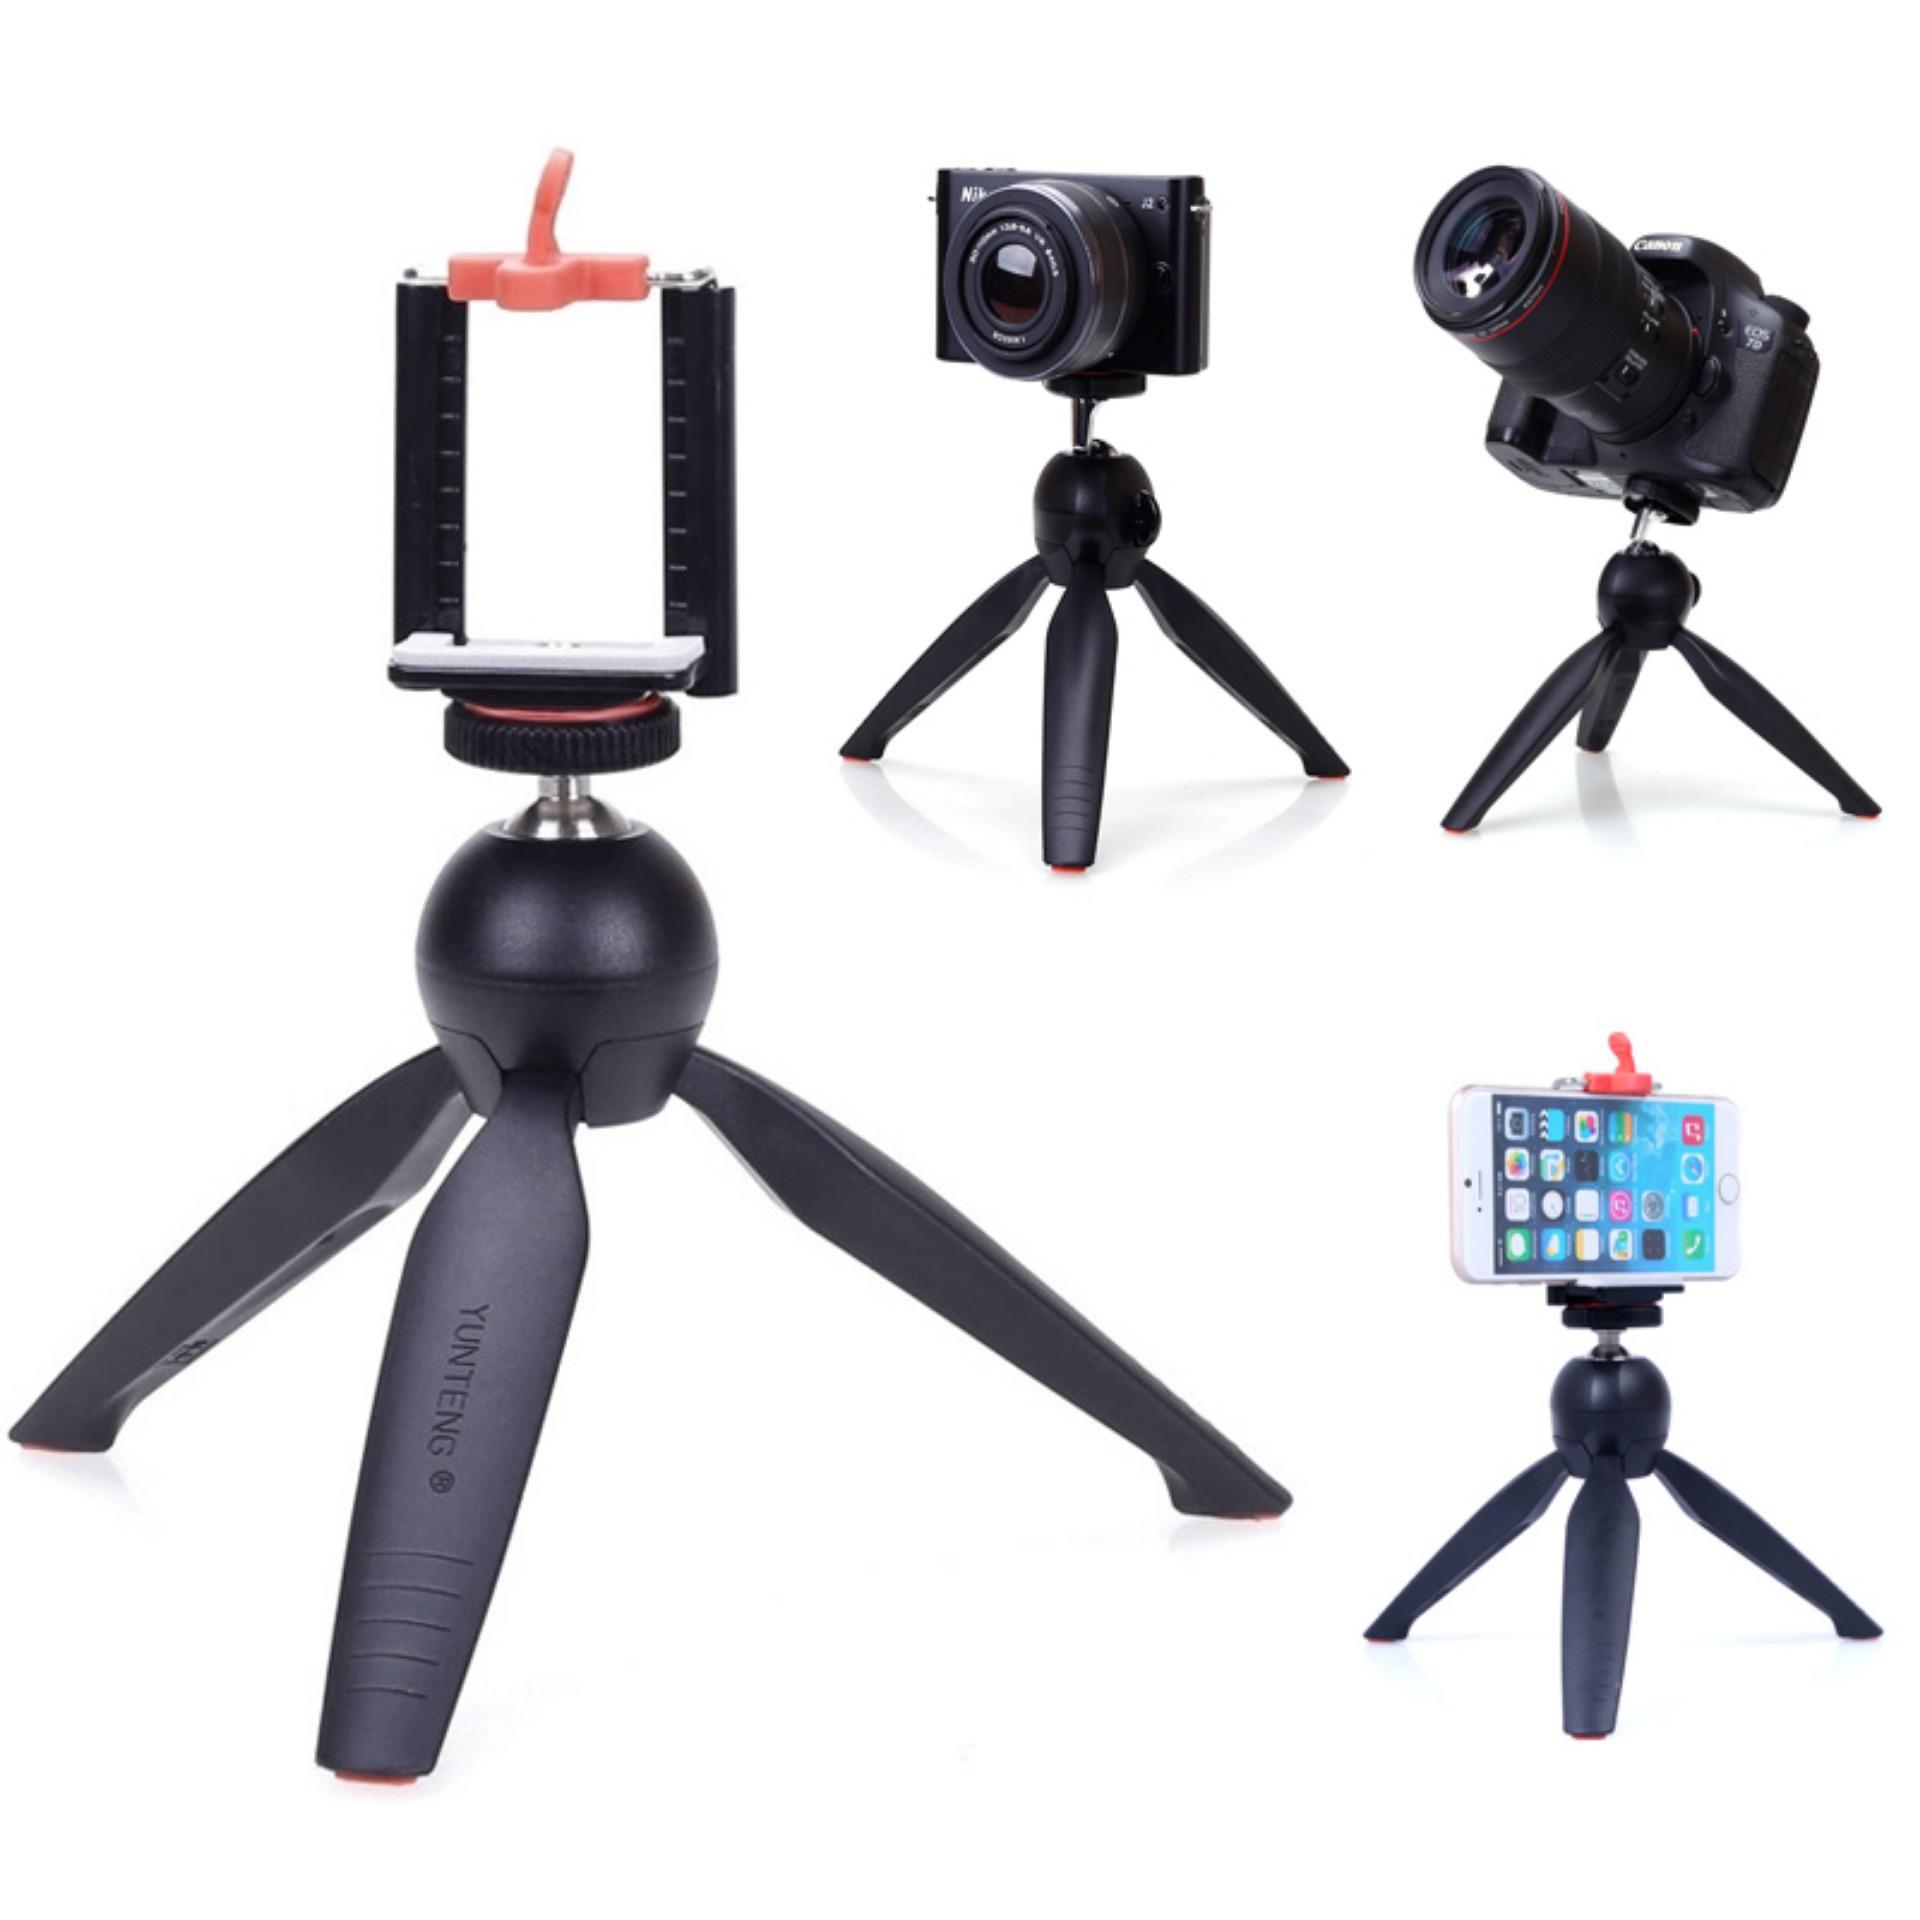 ... Yunteng YT 228 Tripod Camera Digital Phone Universal Holder ...